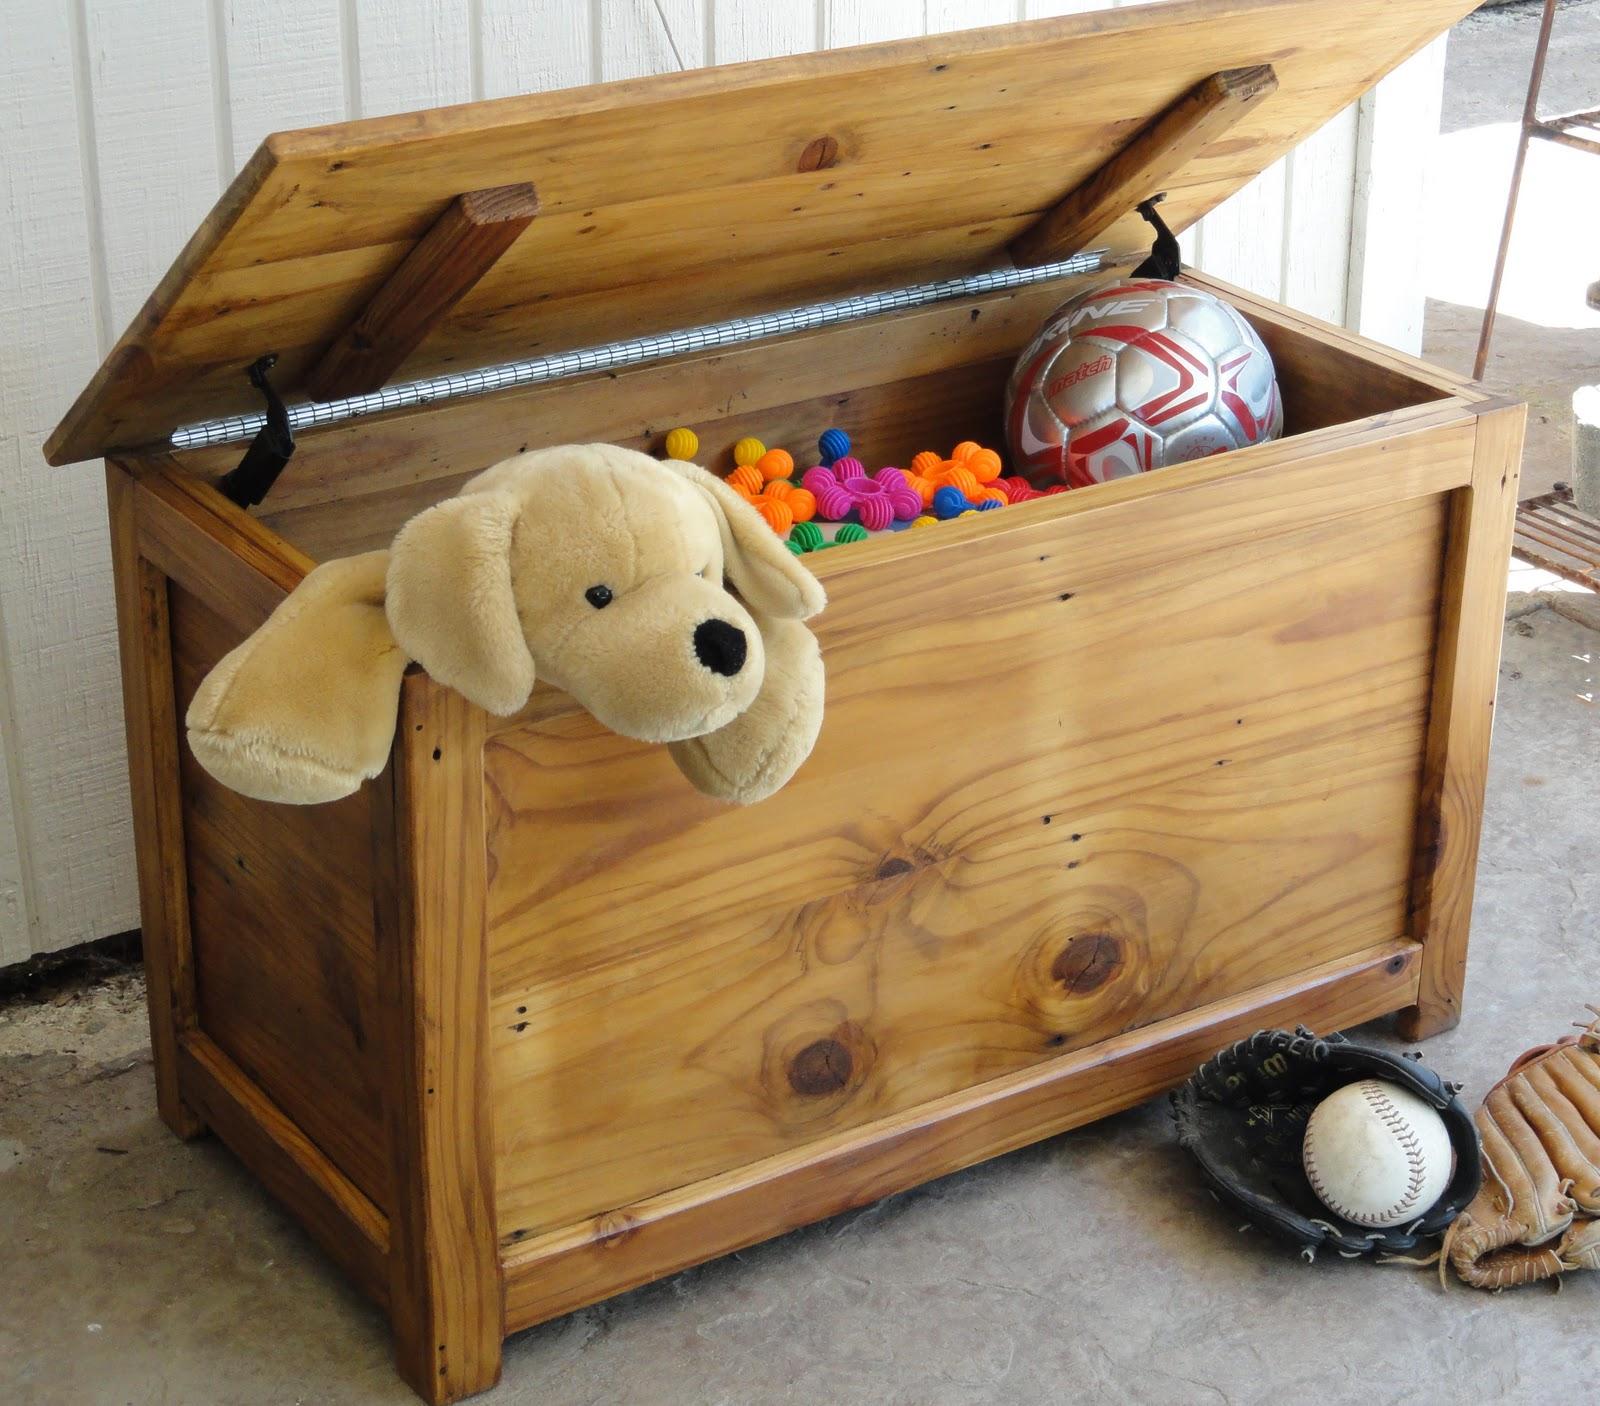 Craftsman's Corner: Nina's Toy Box